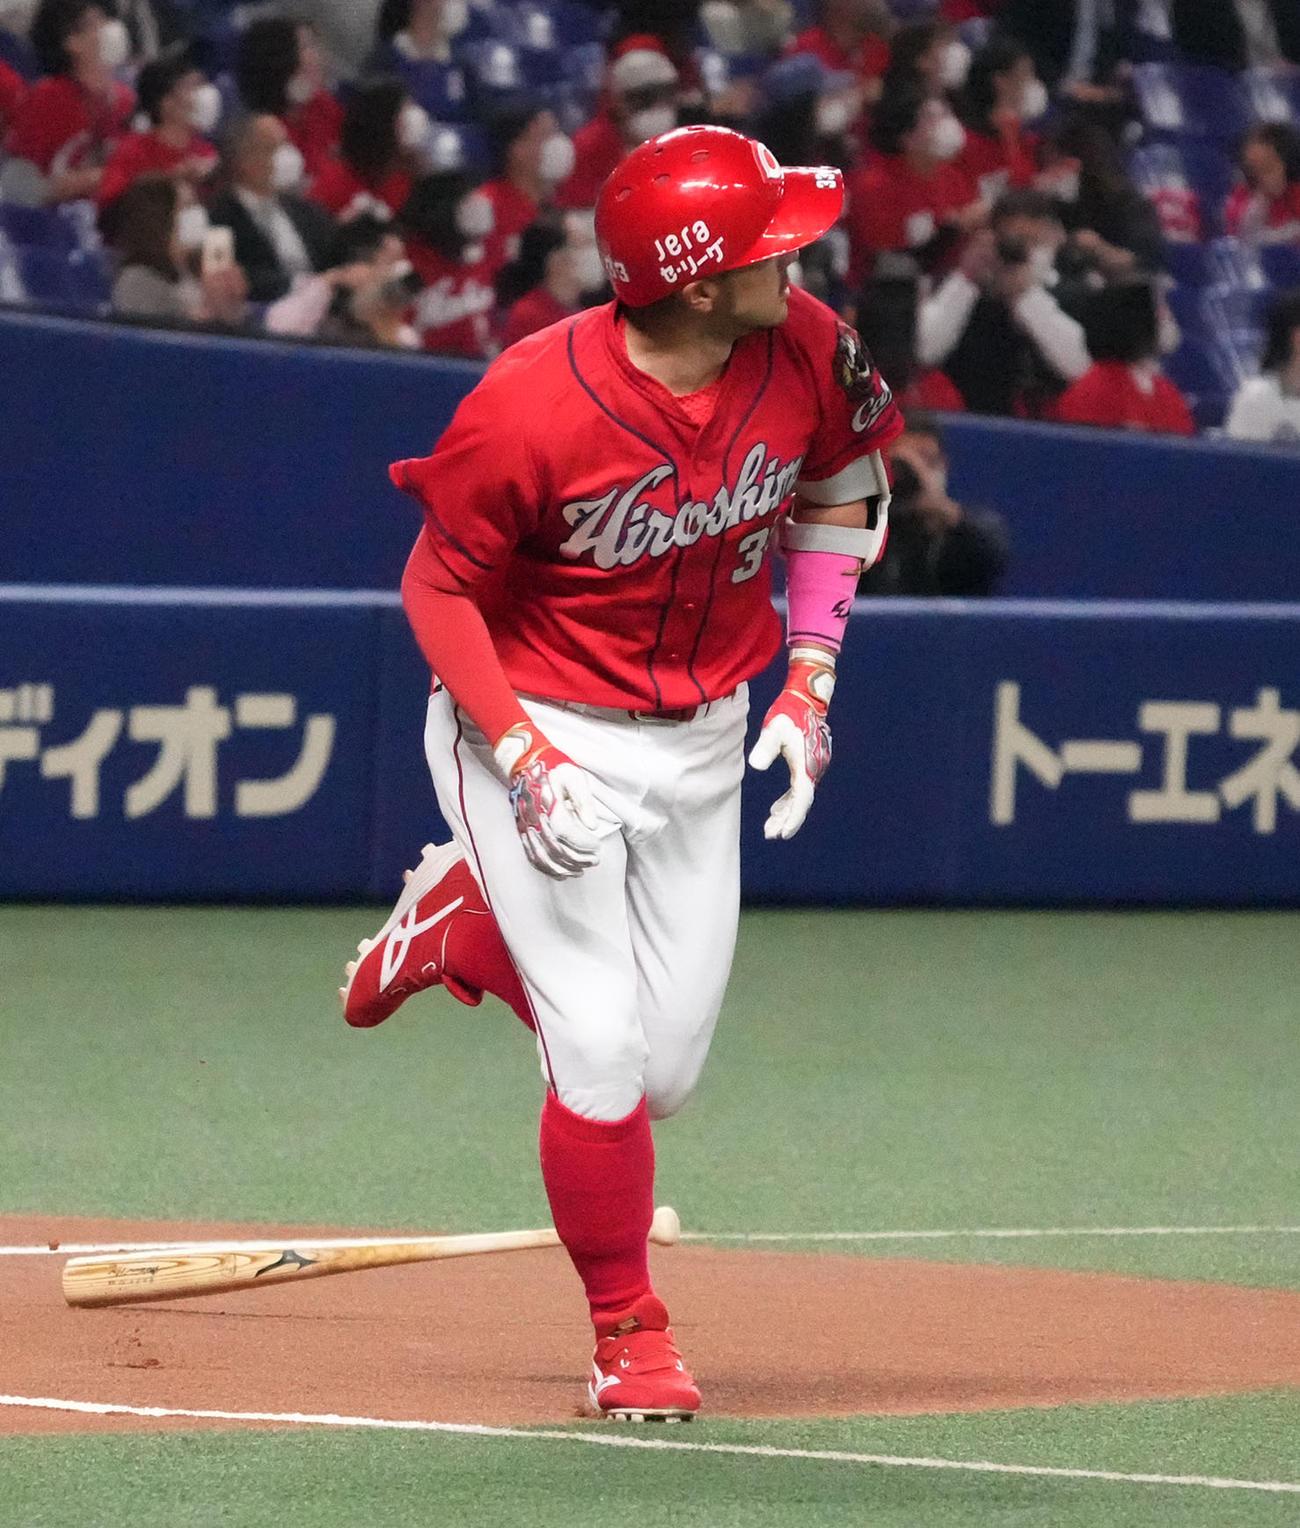 中日対広島 1回表広島無死、左越え本塁打を放った菊池(2021年4月16日撮影)